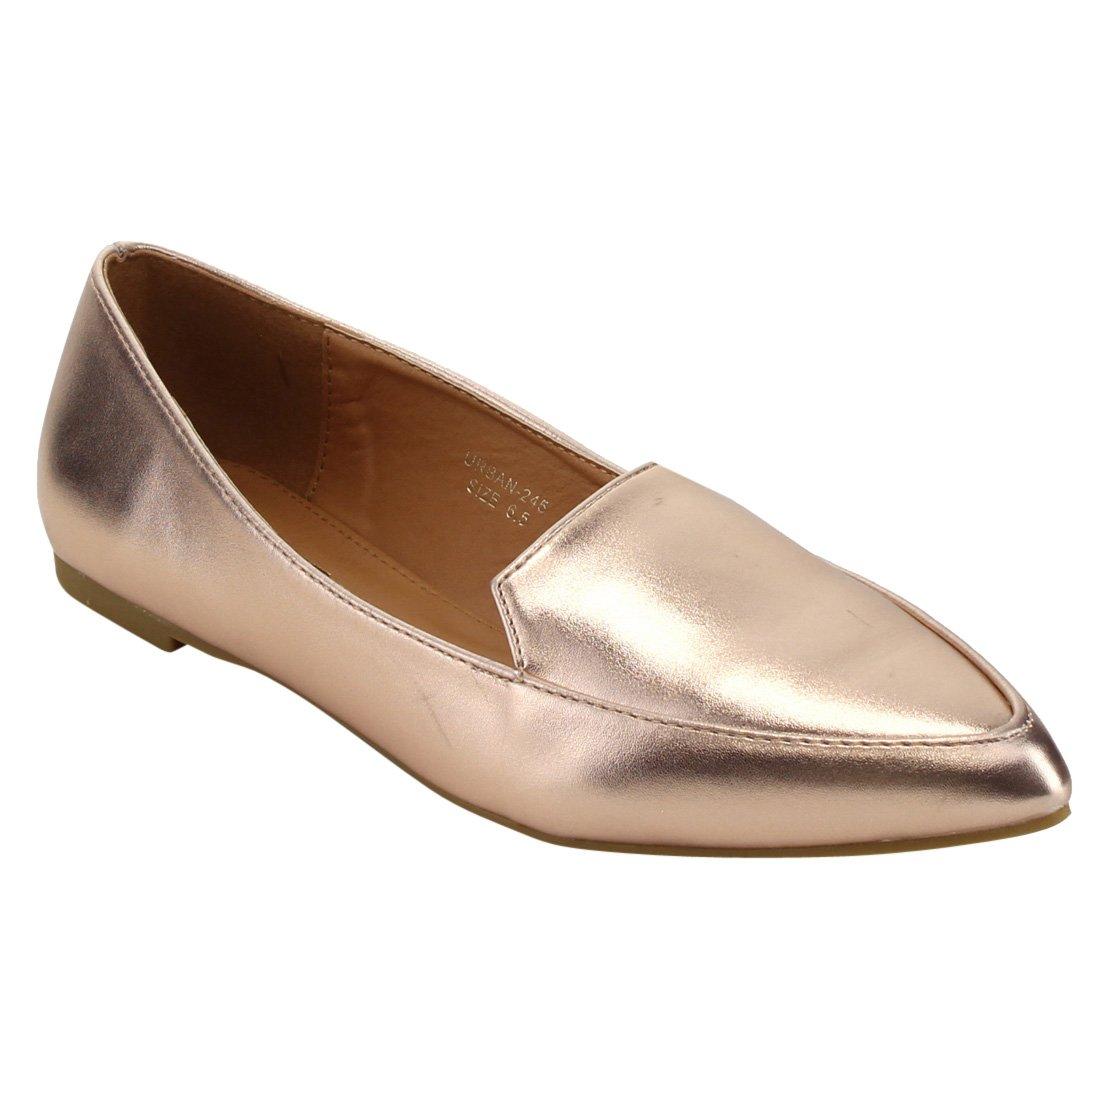 Yoki Women's Urban-245 Ballet Flat B071LKYSVQ 9 B(M) US|Rose Gold